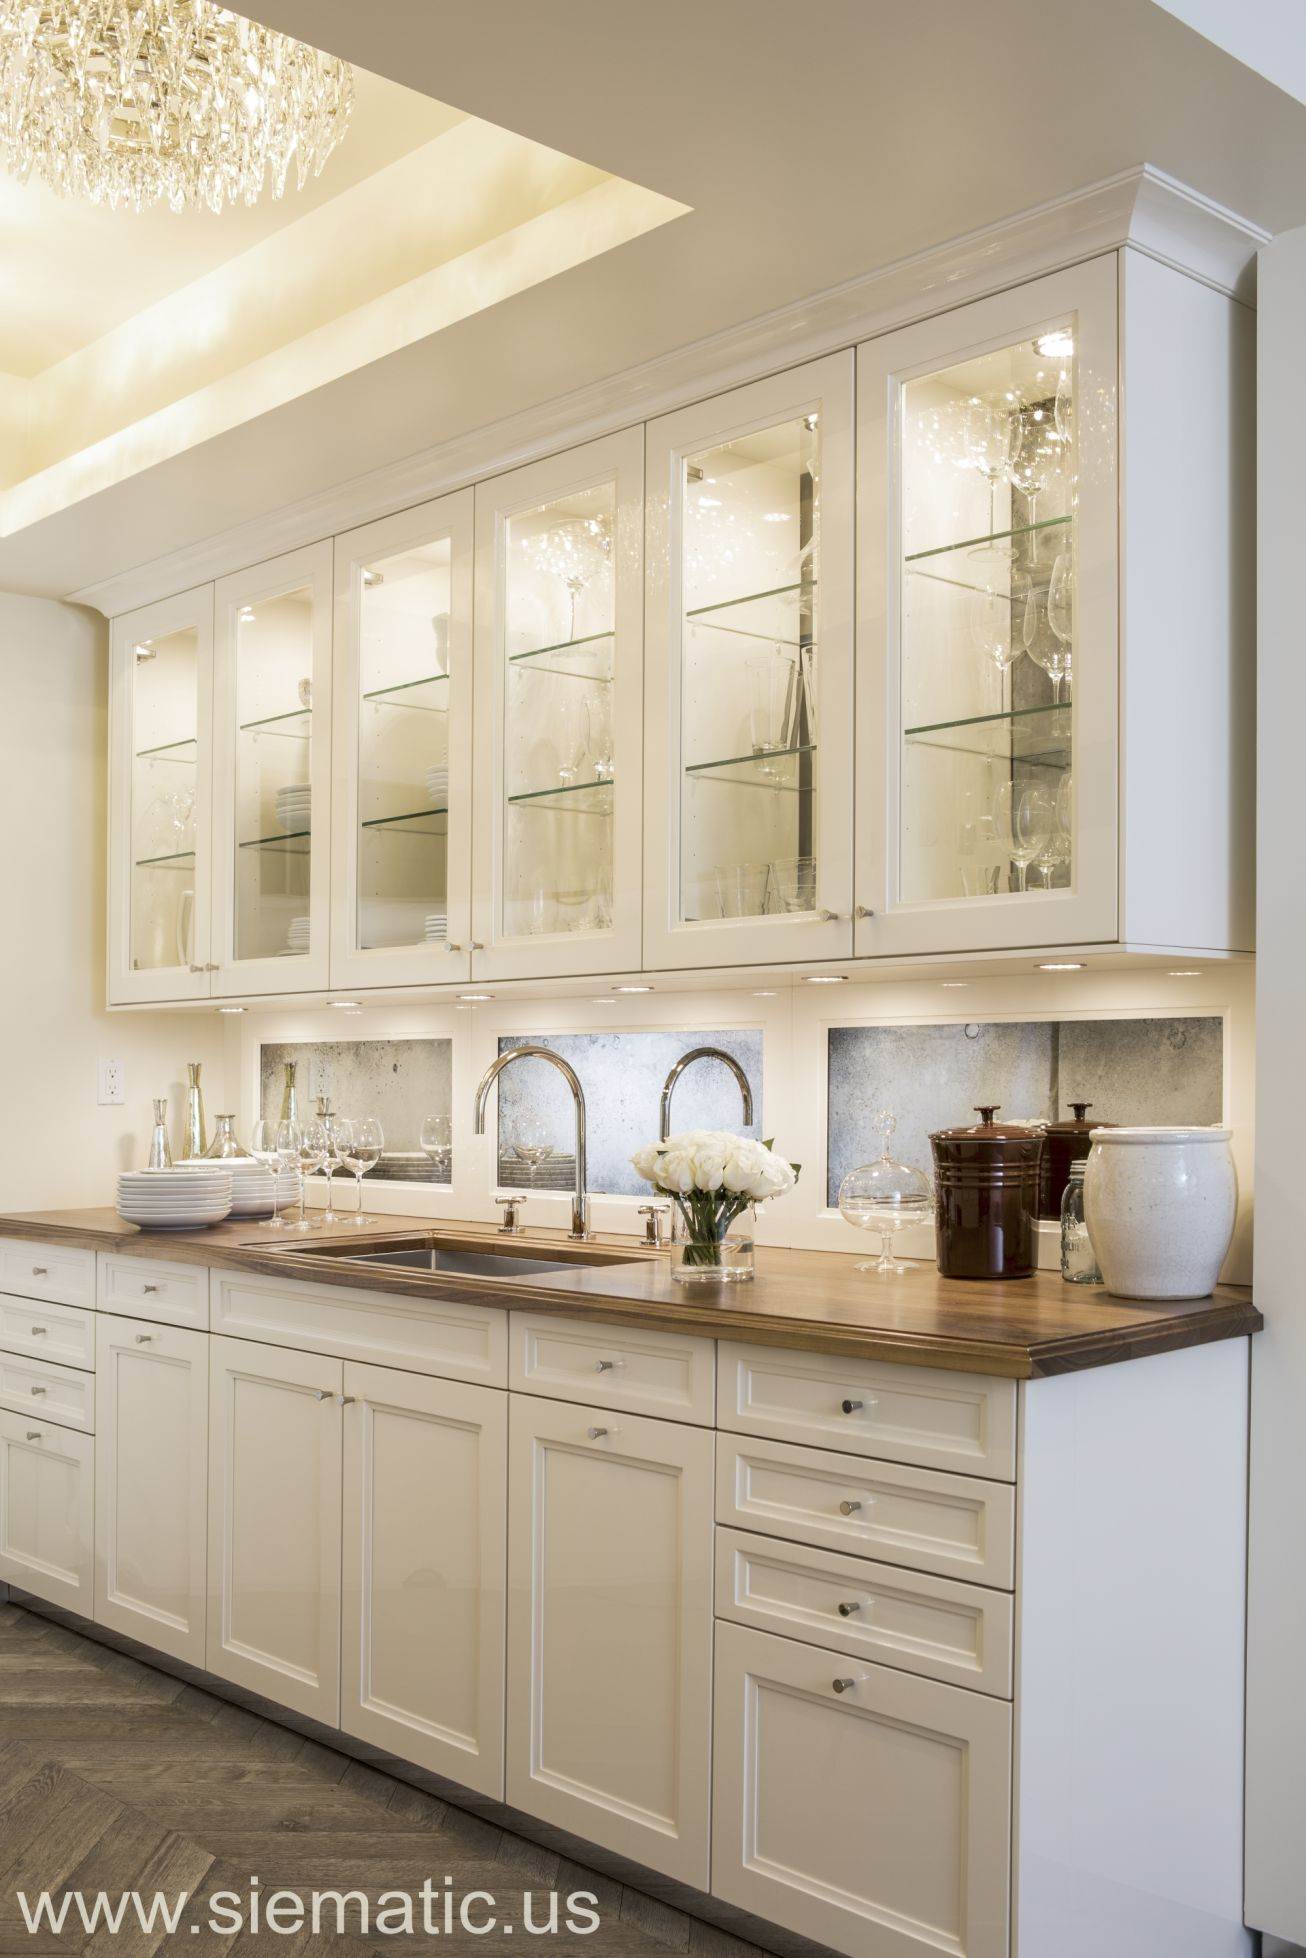 Siematic New York Classic Kitchen Design White Kitchen Interior Design White Kitchen Interior